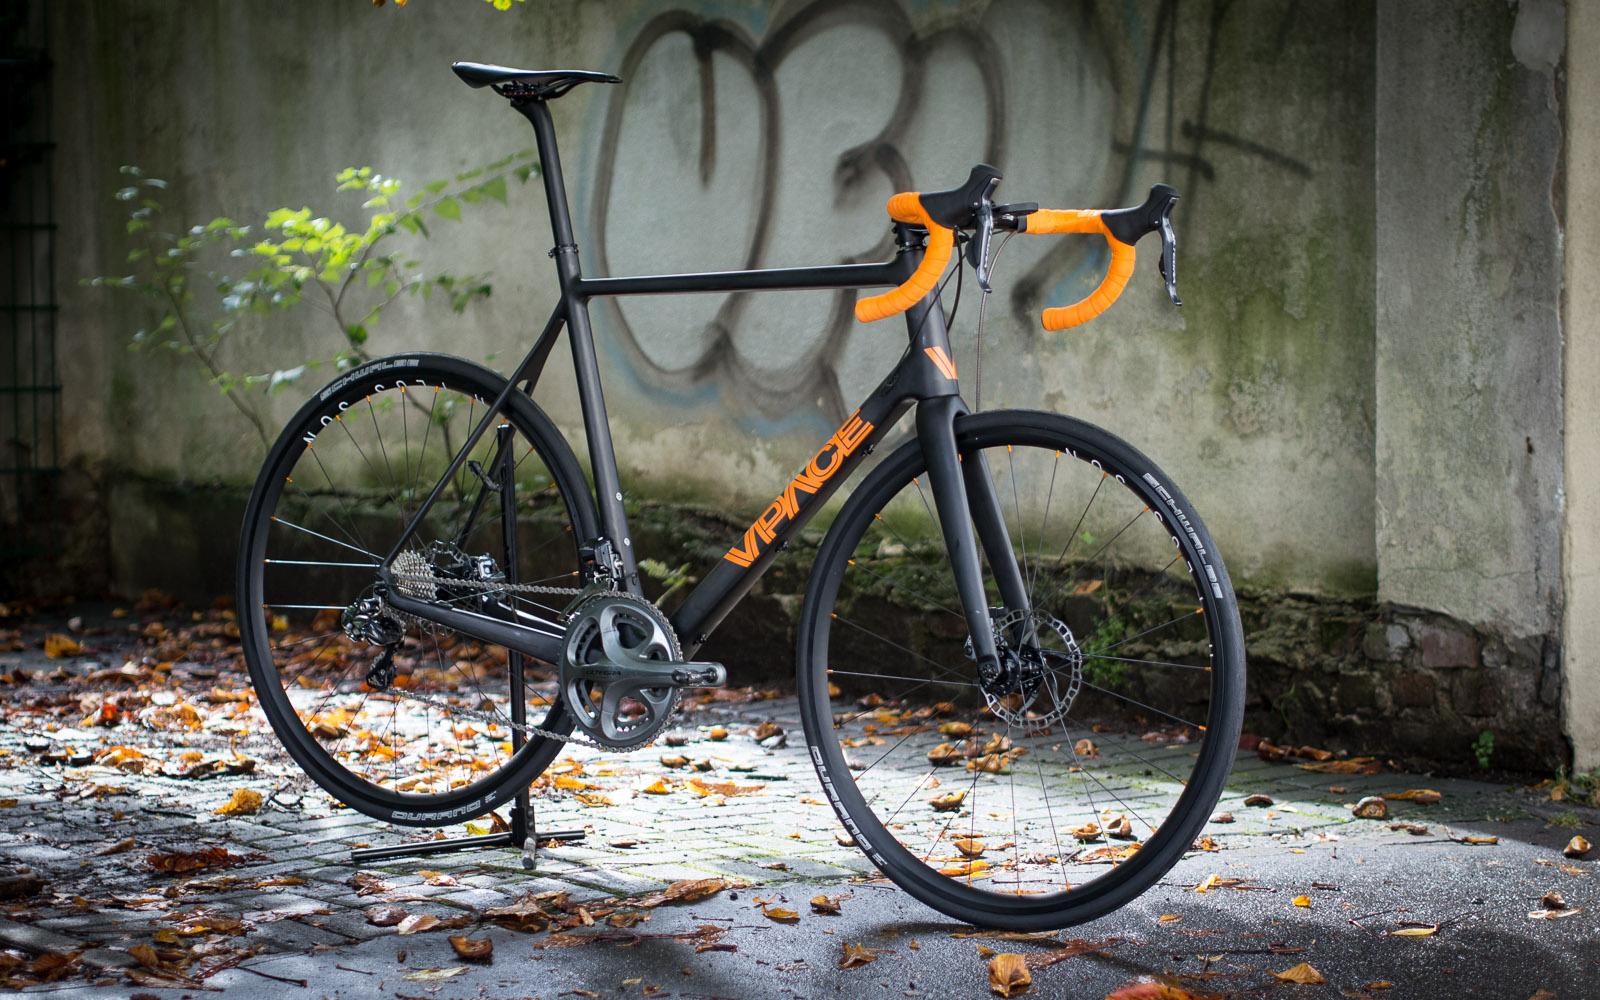 Rennrad Archives - VPACE Bikes